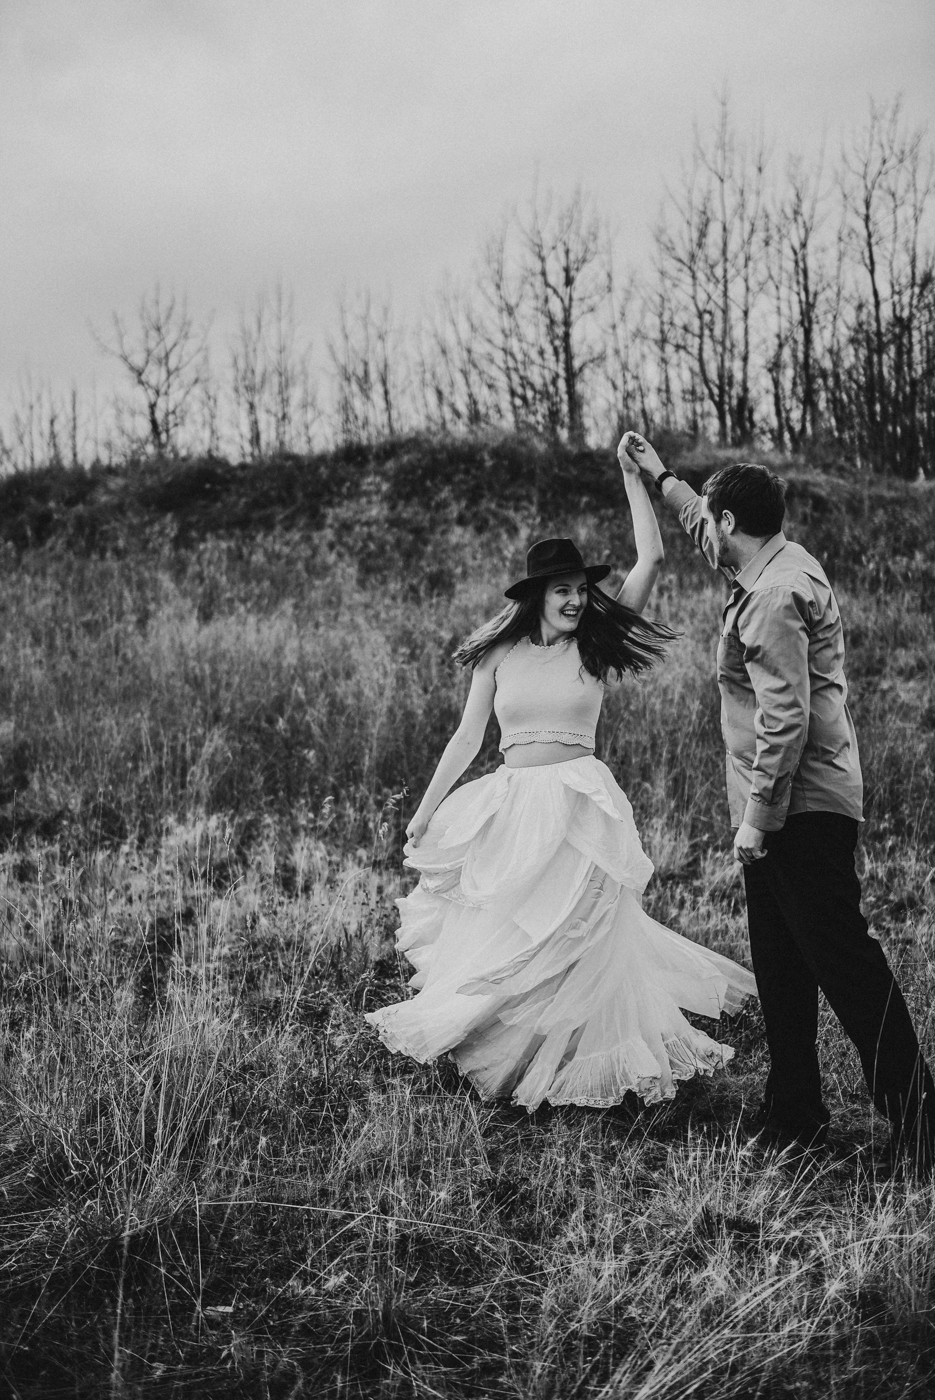 FortSt.John_photographer_TyraEPhotography_Wedding_Couple_Family_Photograhy_DawsonCreek_Elopement_Bride_Boduoir_Portraits-44.jpg